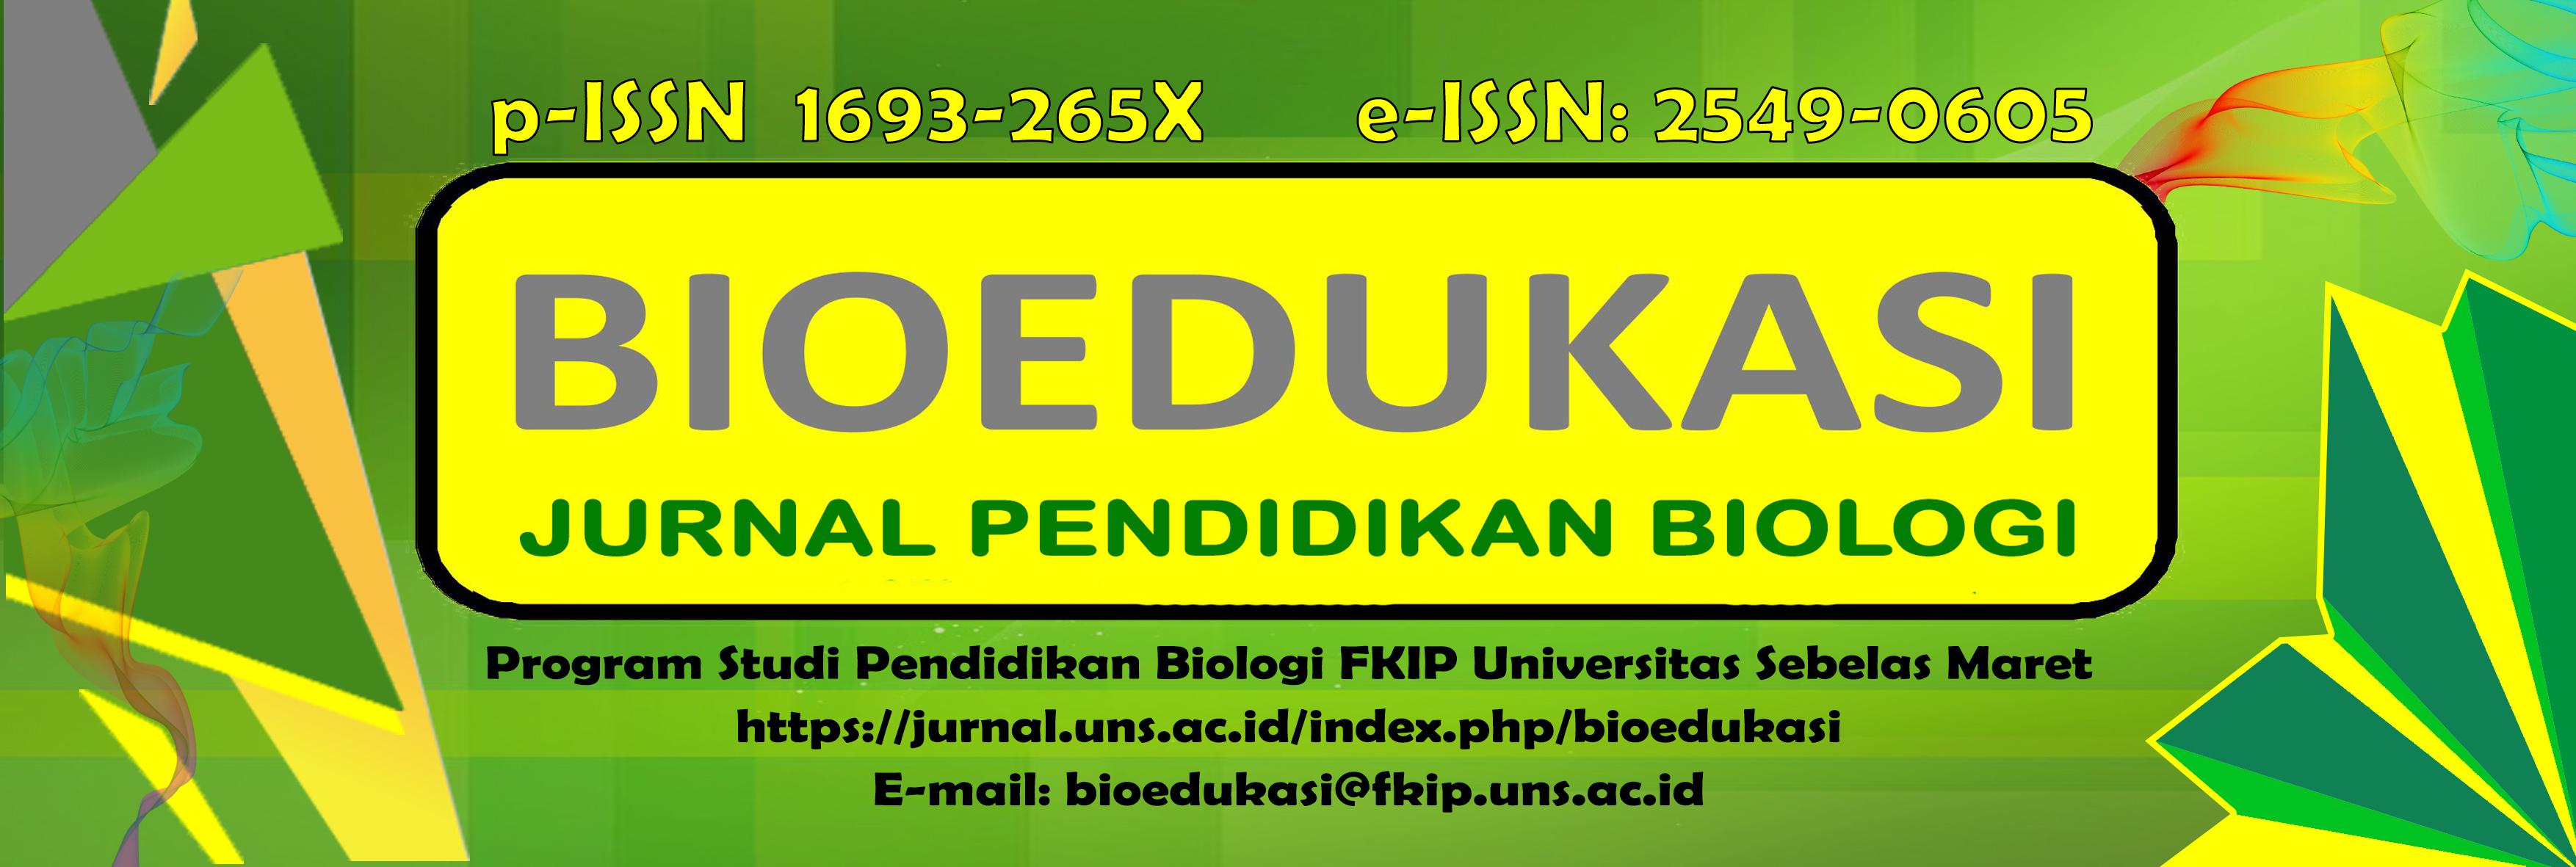 BIOEDUKASI: Jurnal Pendidikan Biologi